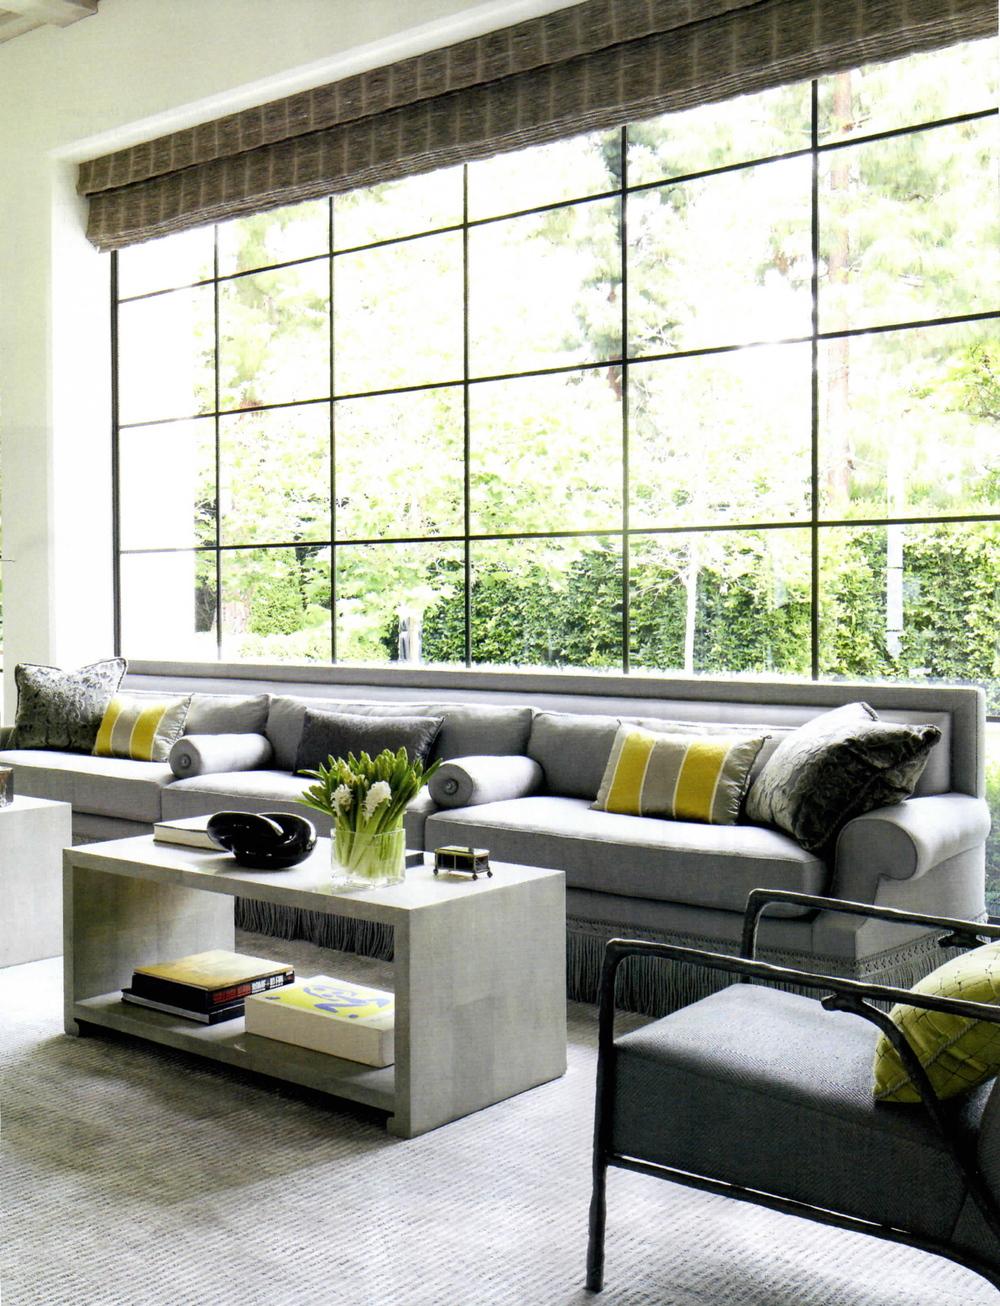 fabricant v randa grenoble. Black Bedroom Furniture Sets. Home Design Ideas